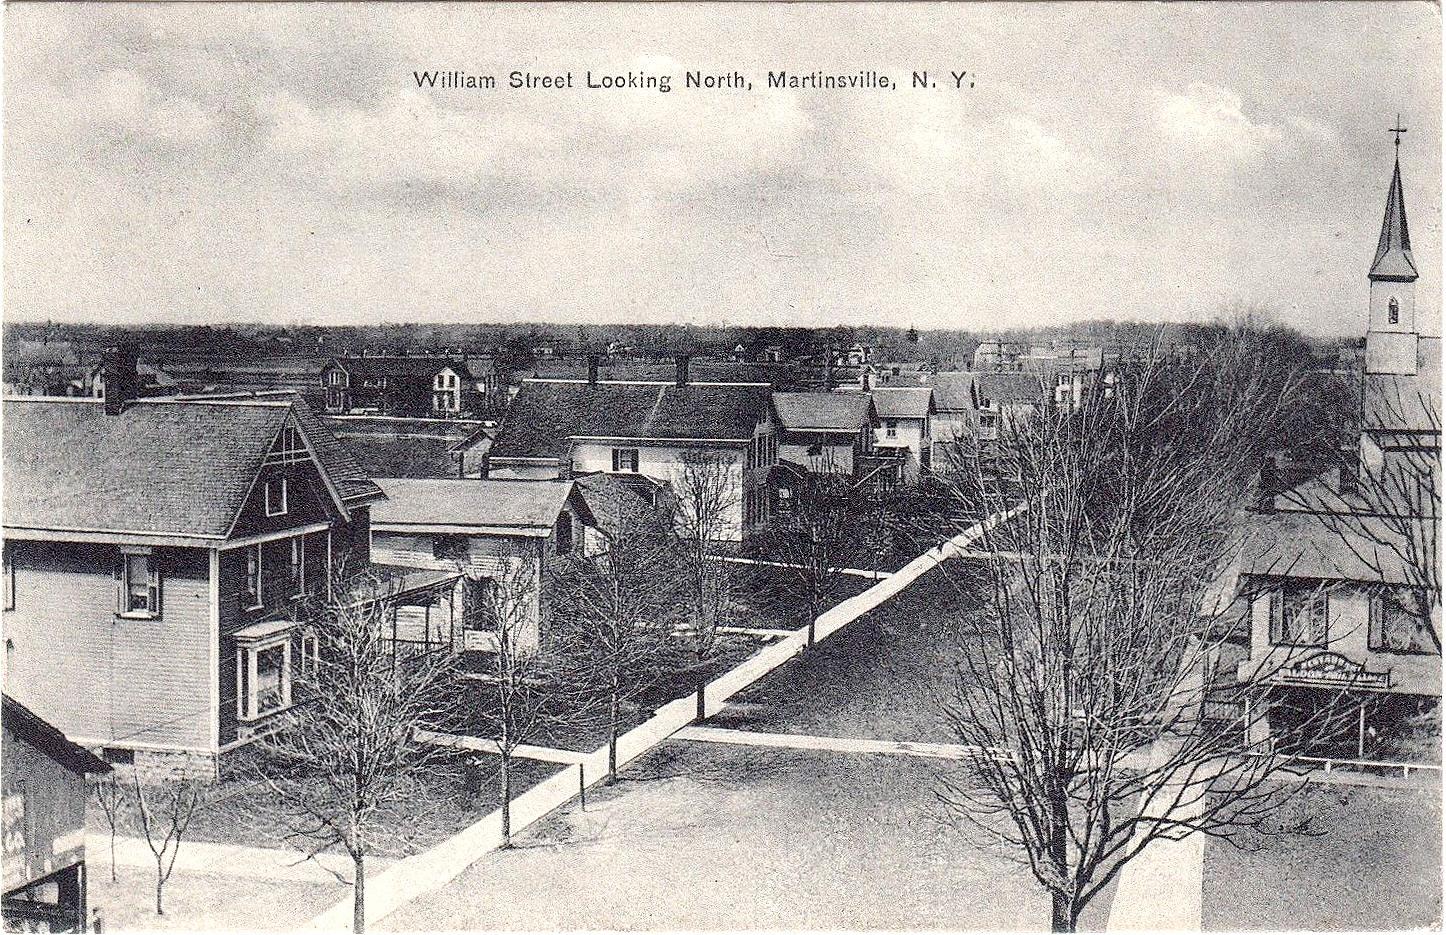 William Street Looking North, Martinsville, postcard (c1910).jpg